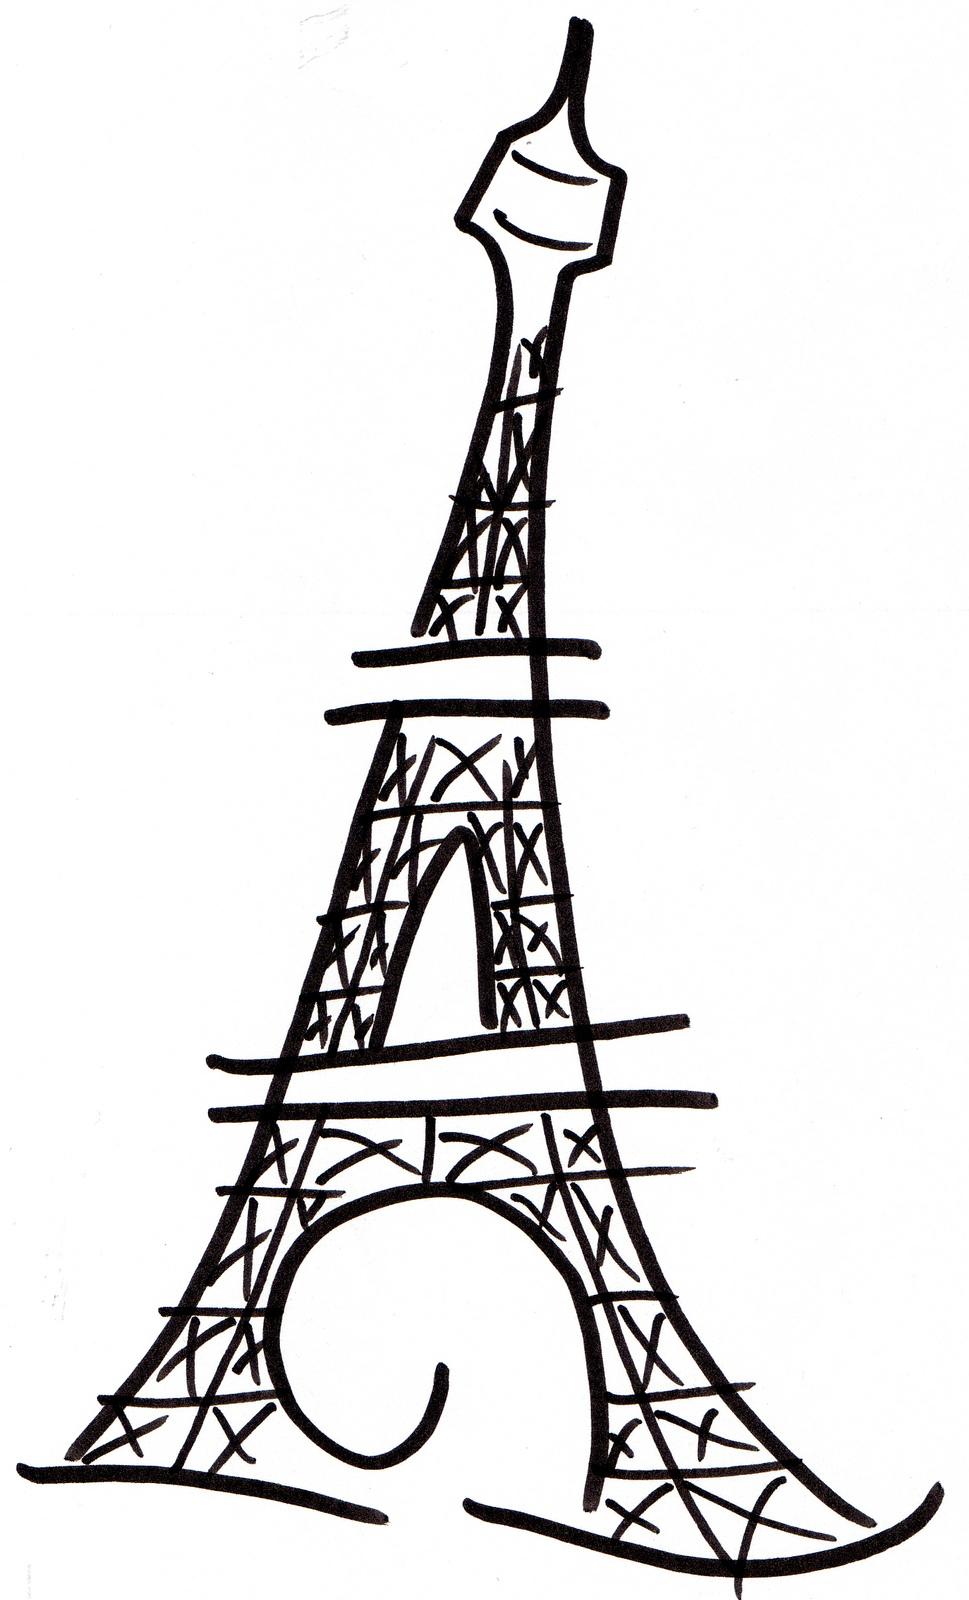 Eiffel Tower Clipart - Cliparts.co